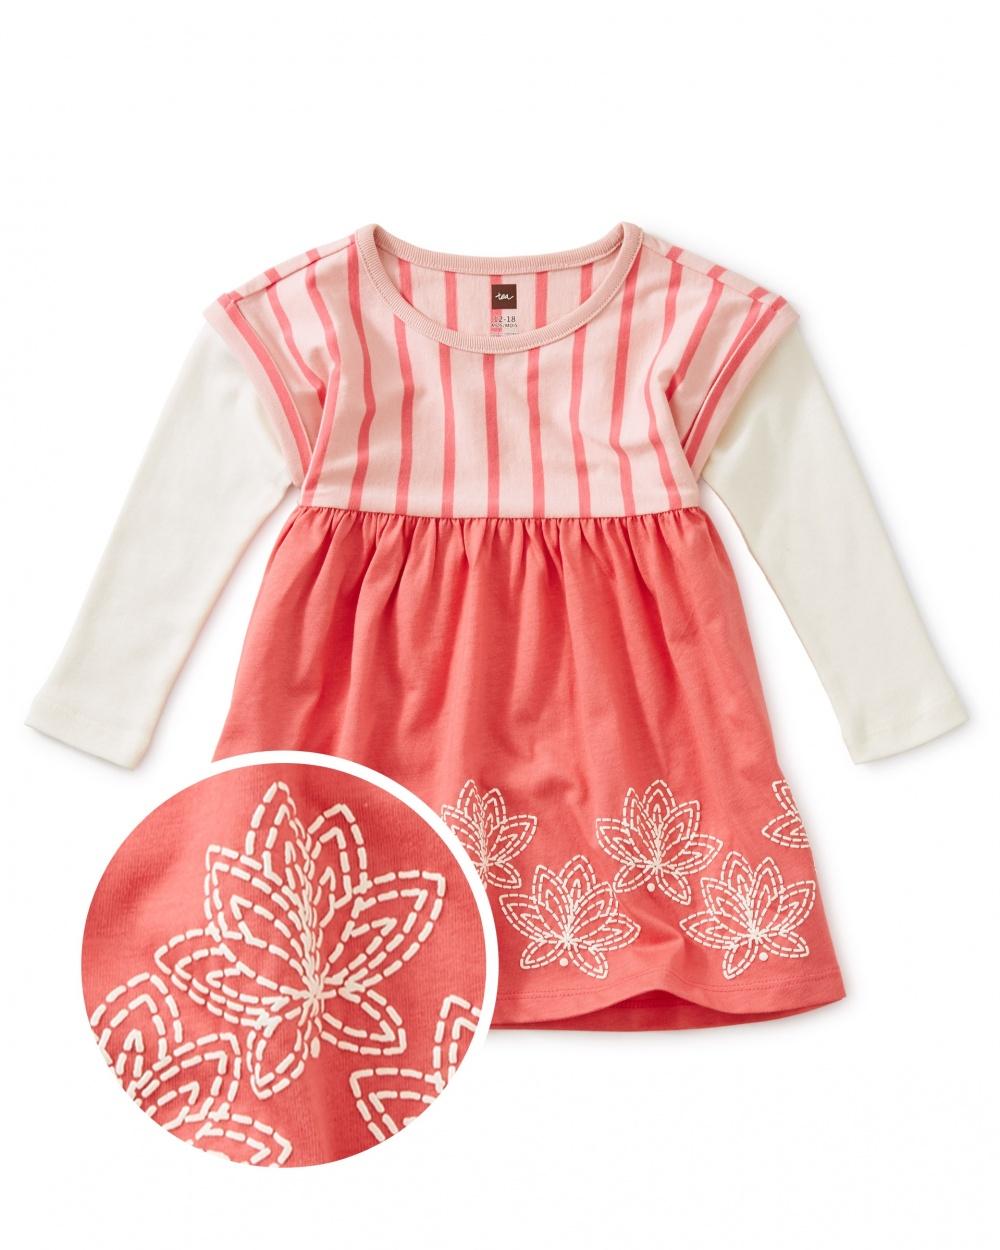 Lotus Layered Sleeve Baby Dress